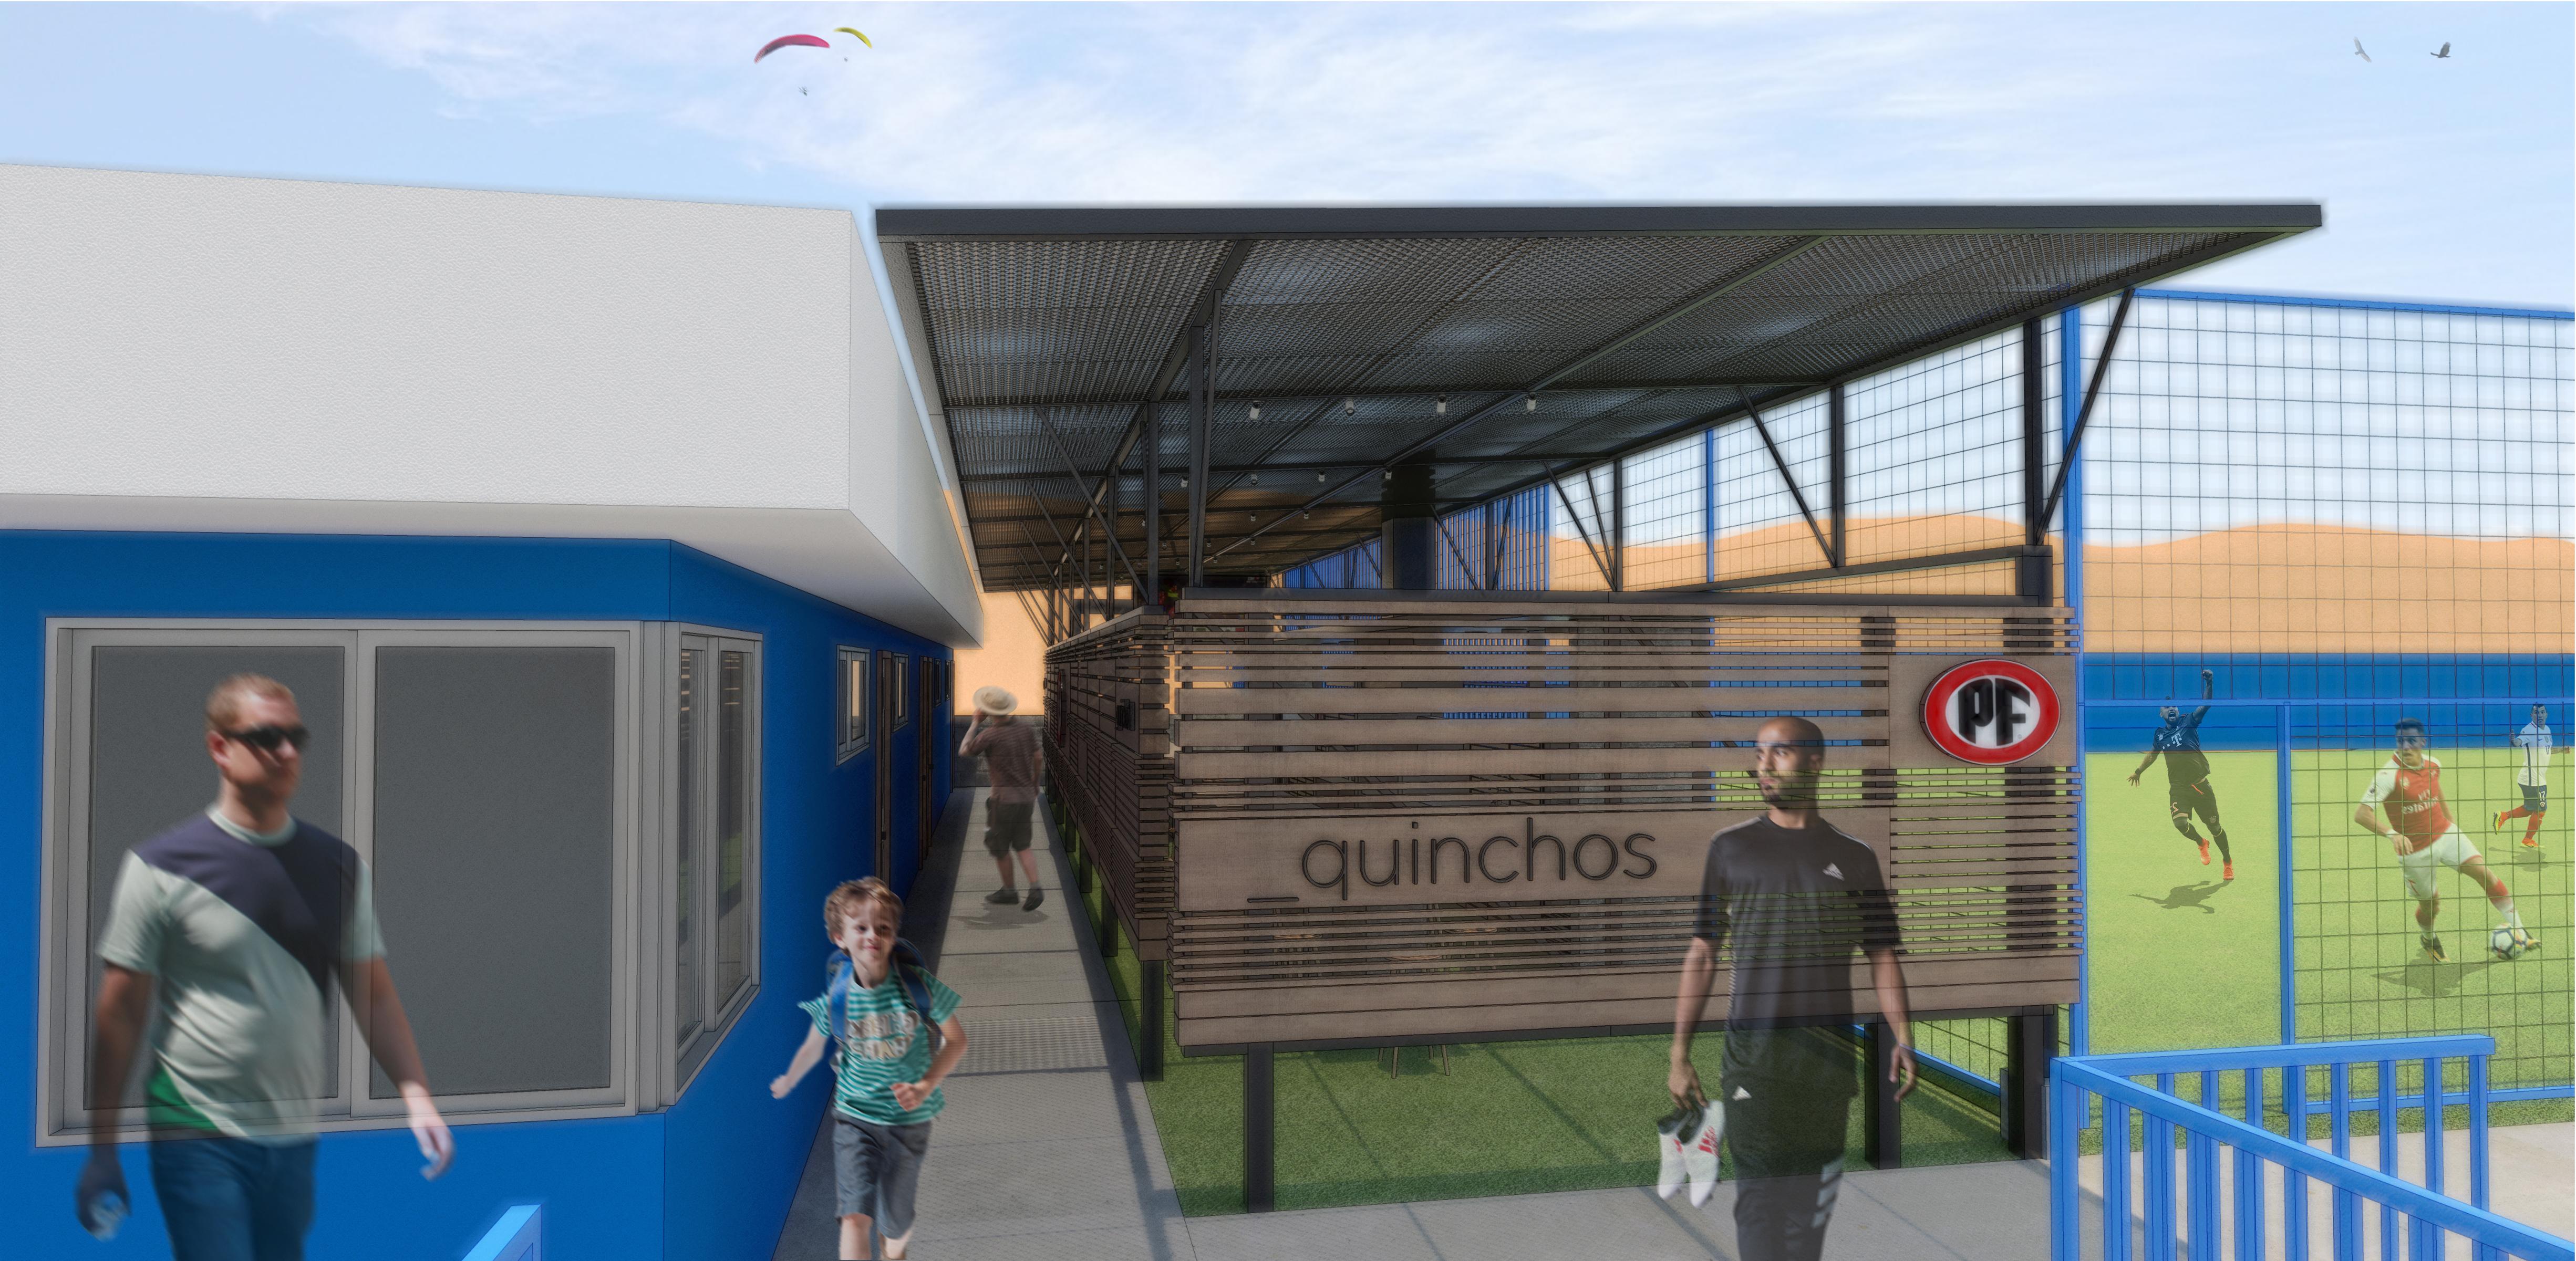 Quinchos Club Apoquindo